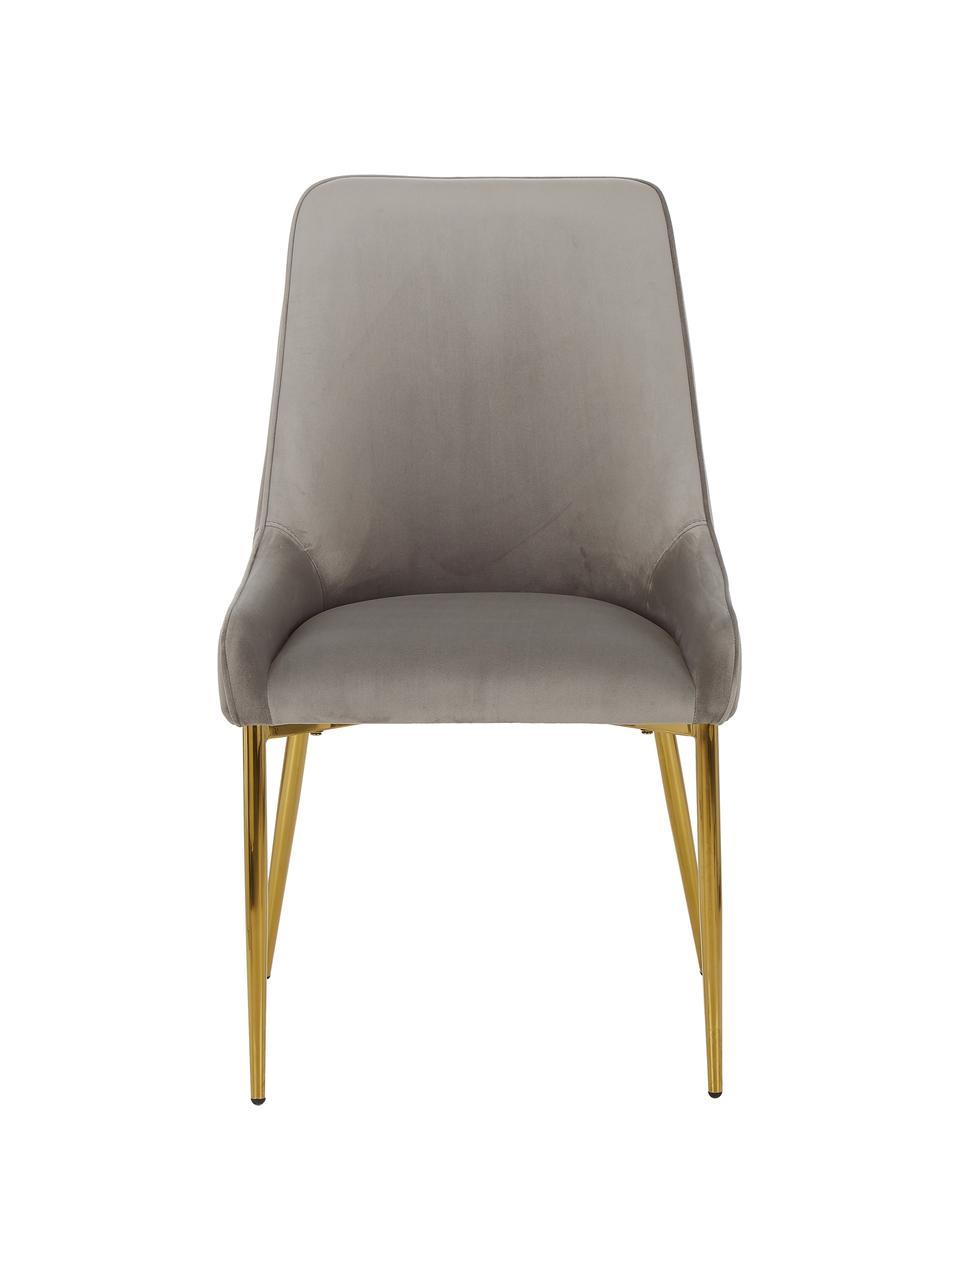 Fluwelen stoel Ava in taupe, Bekleding: fluweel (100% polyester), Poten: gegalvaniseerd metaal, Fluweel taupe, B 55  x D 60 cm